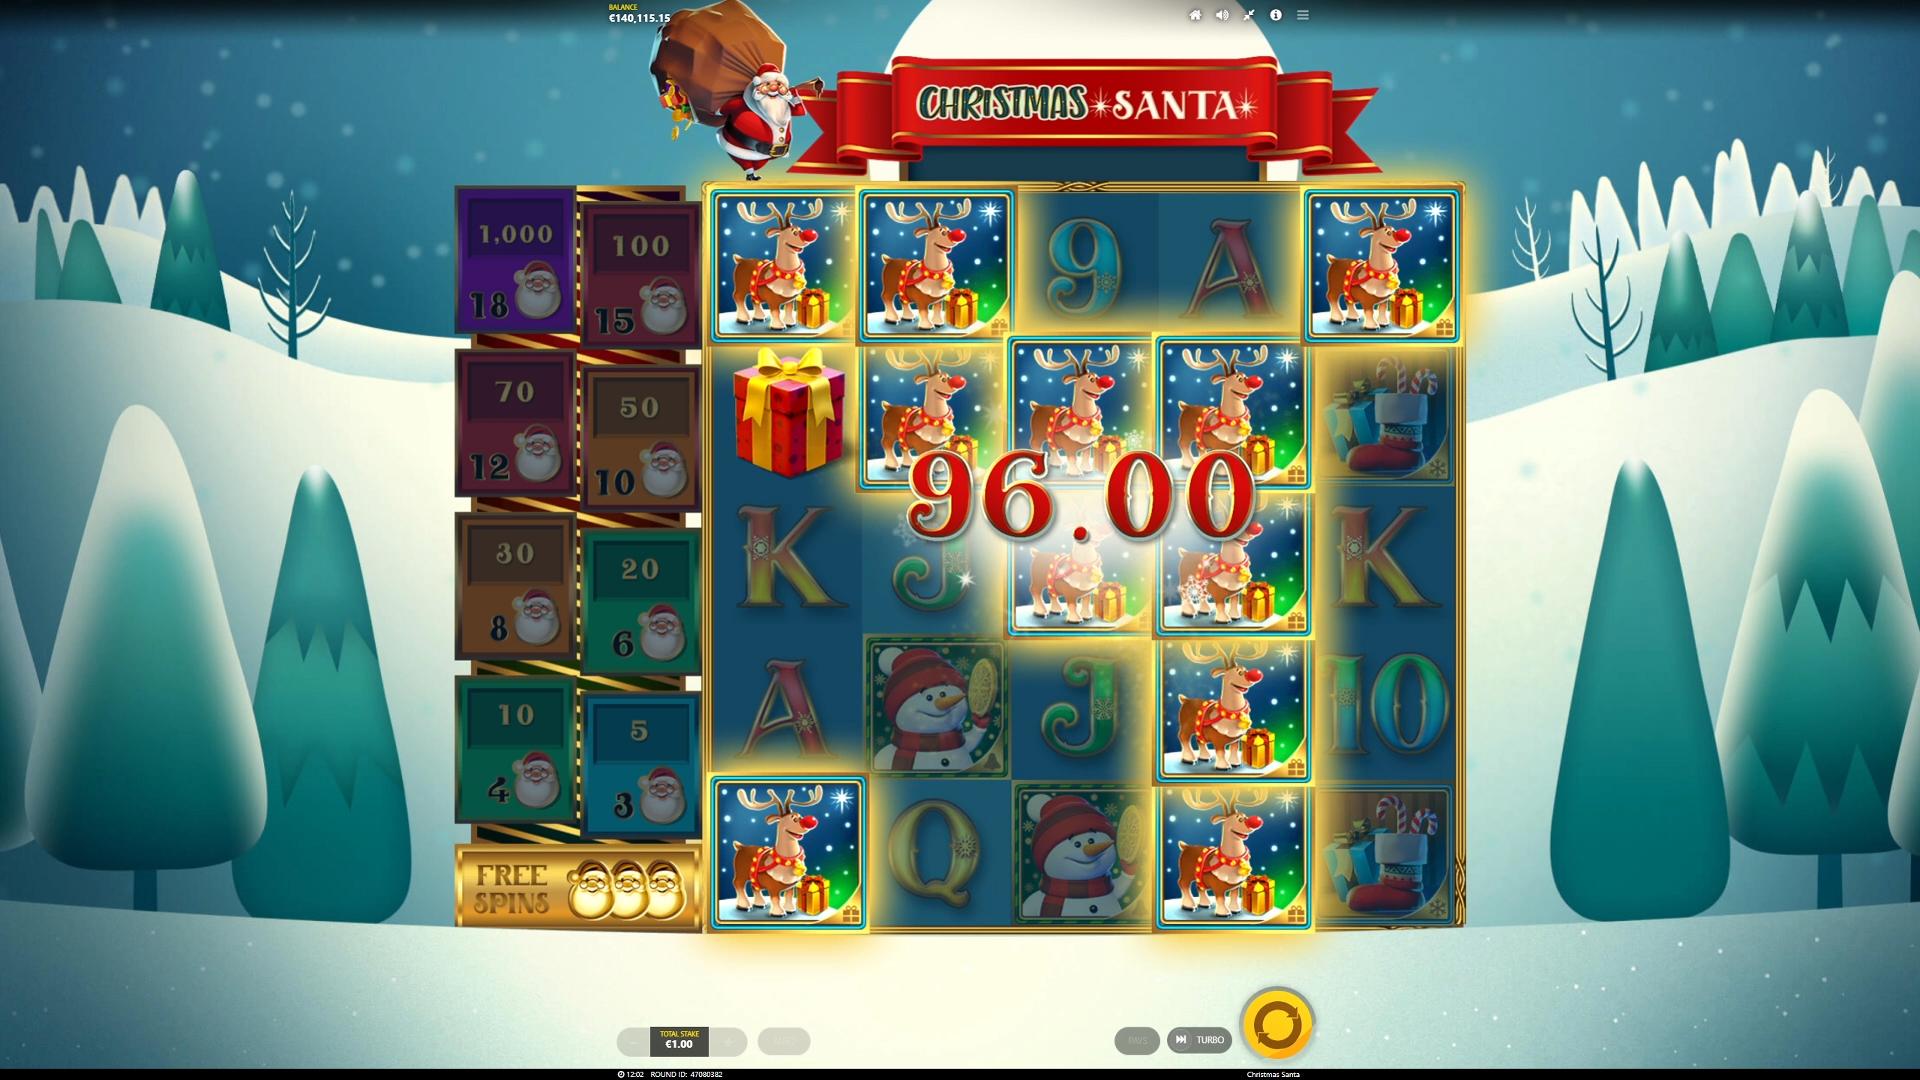 Christmas_Santa_Screenshot_Mega_Win_High_Symbol_